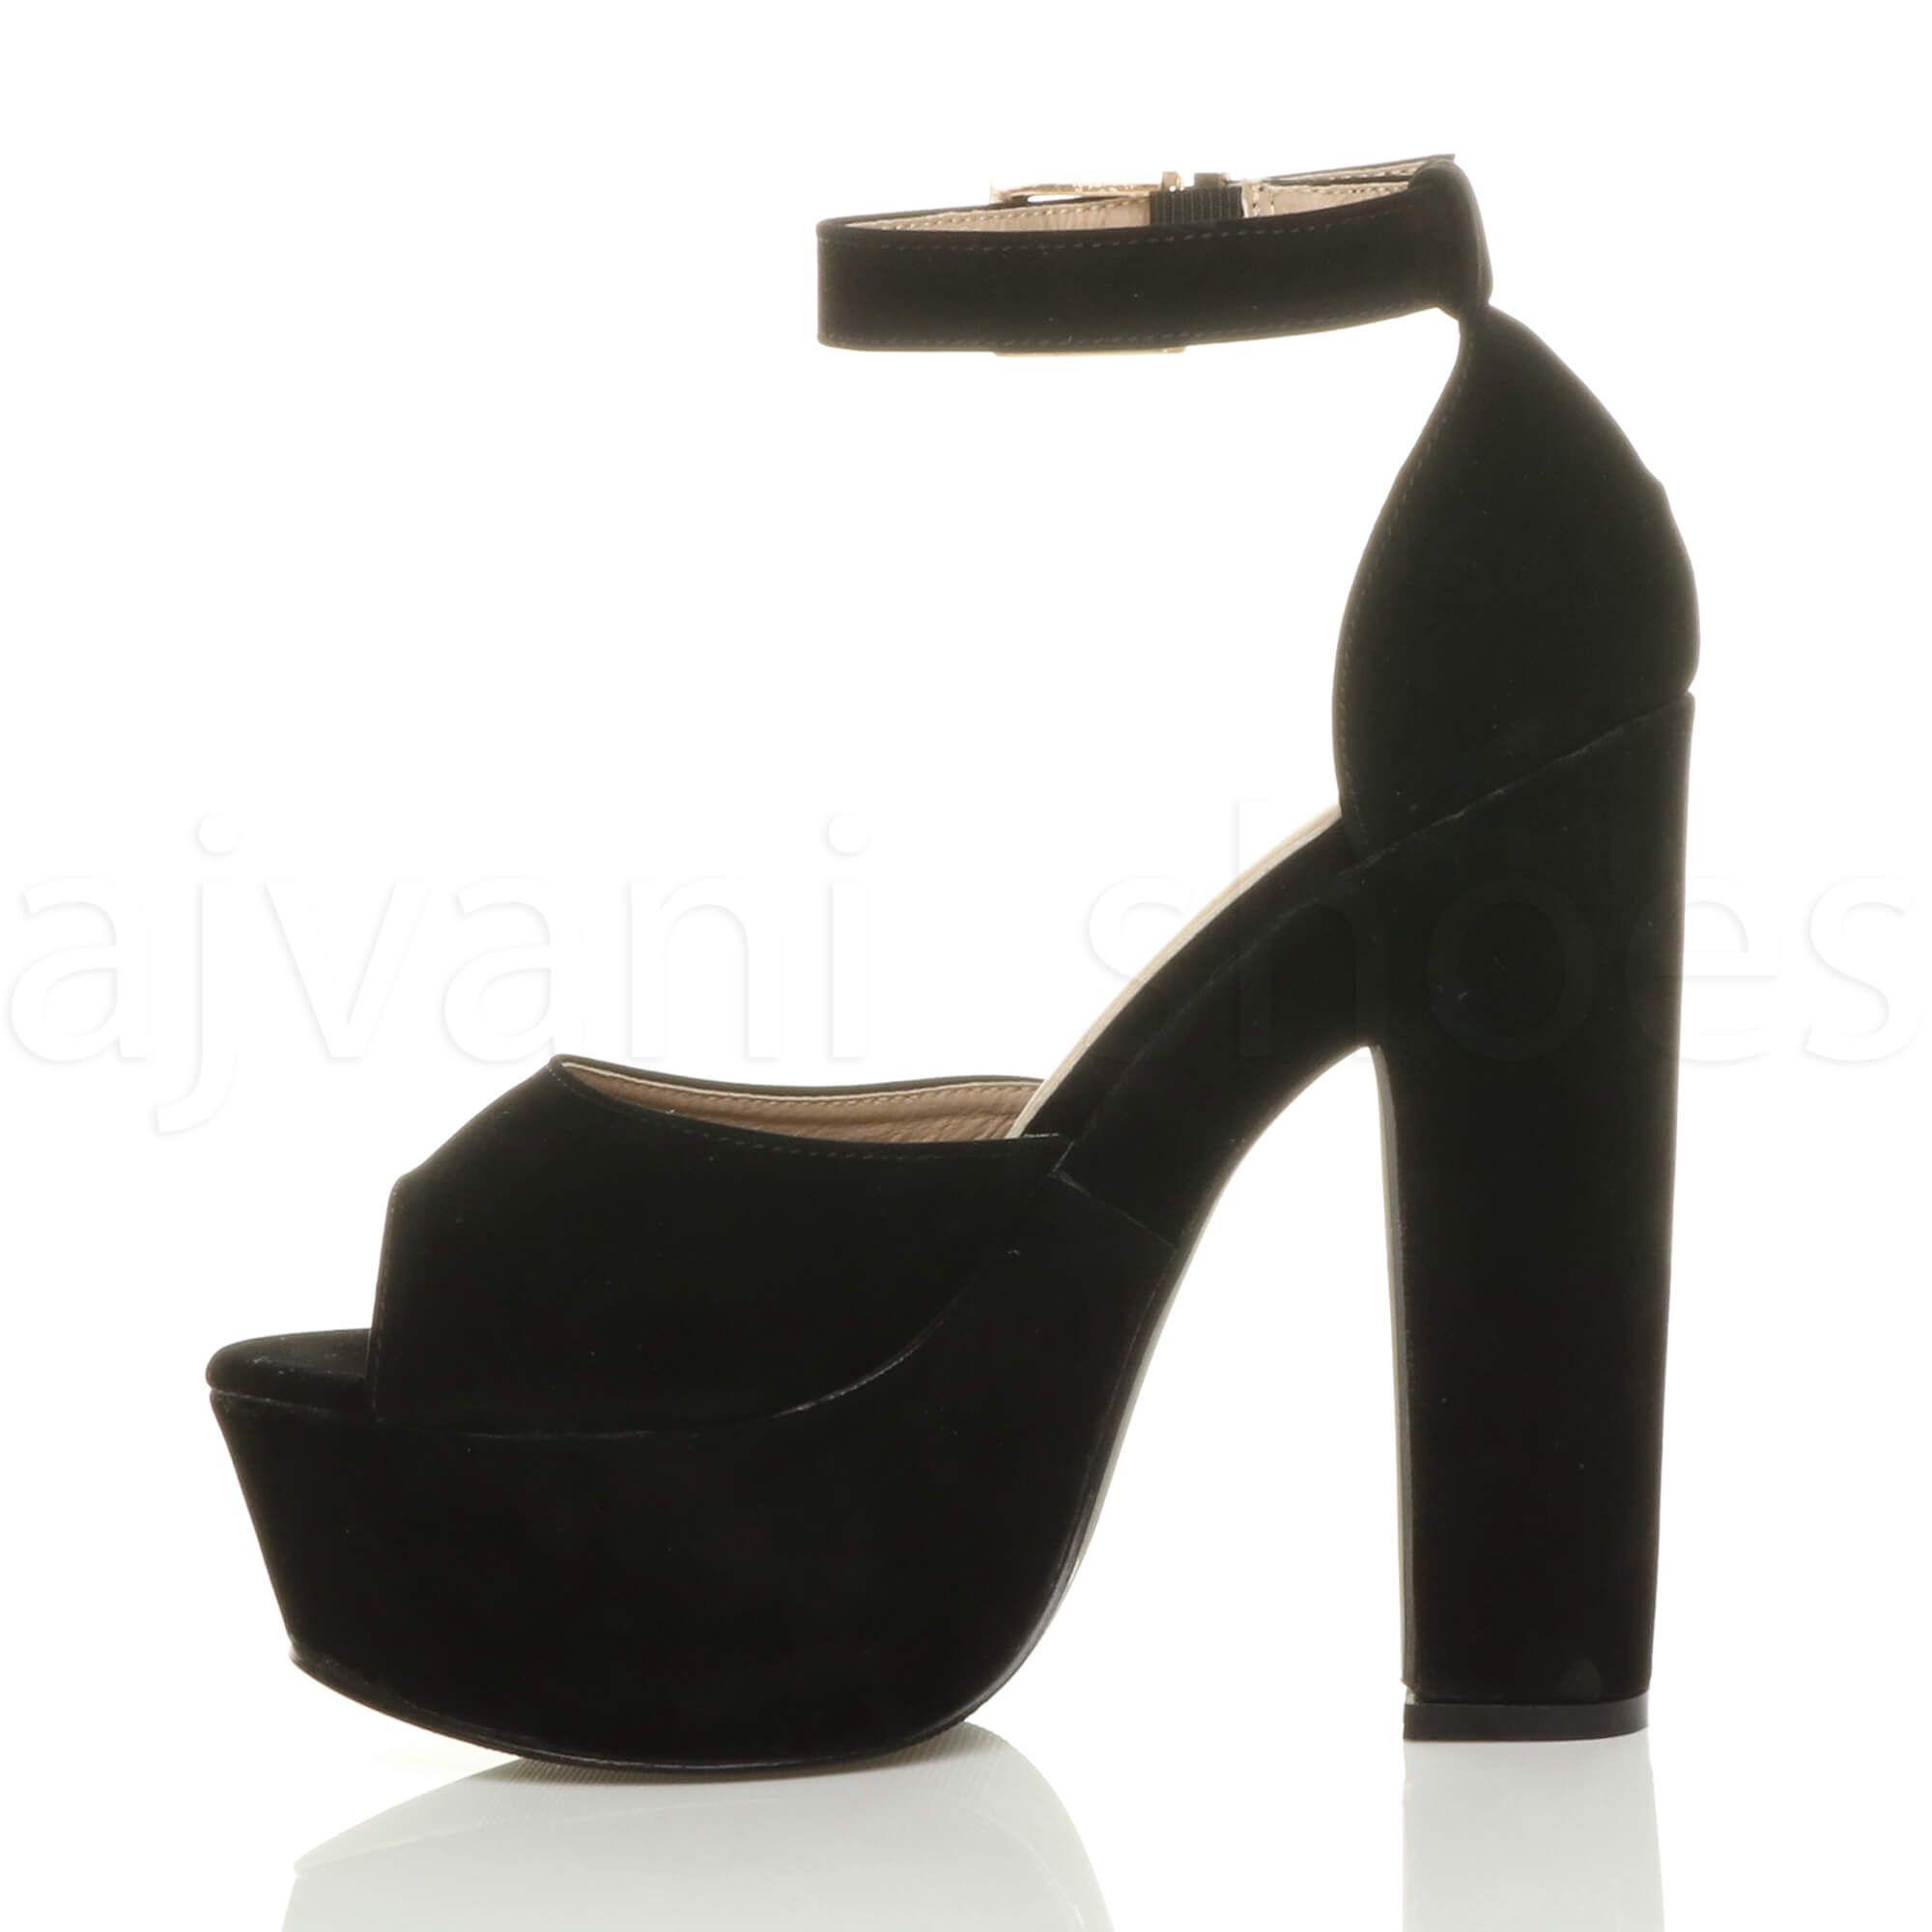 Modelos modernos de zapatos de plataformas, diseños únicos